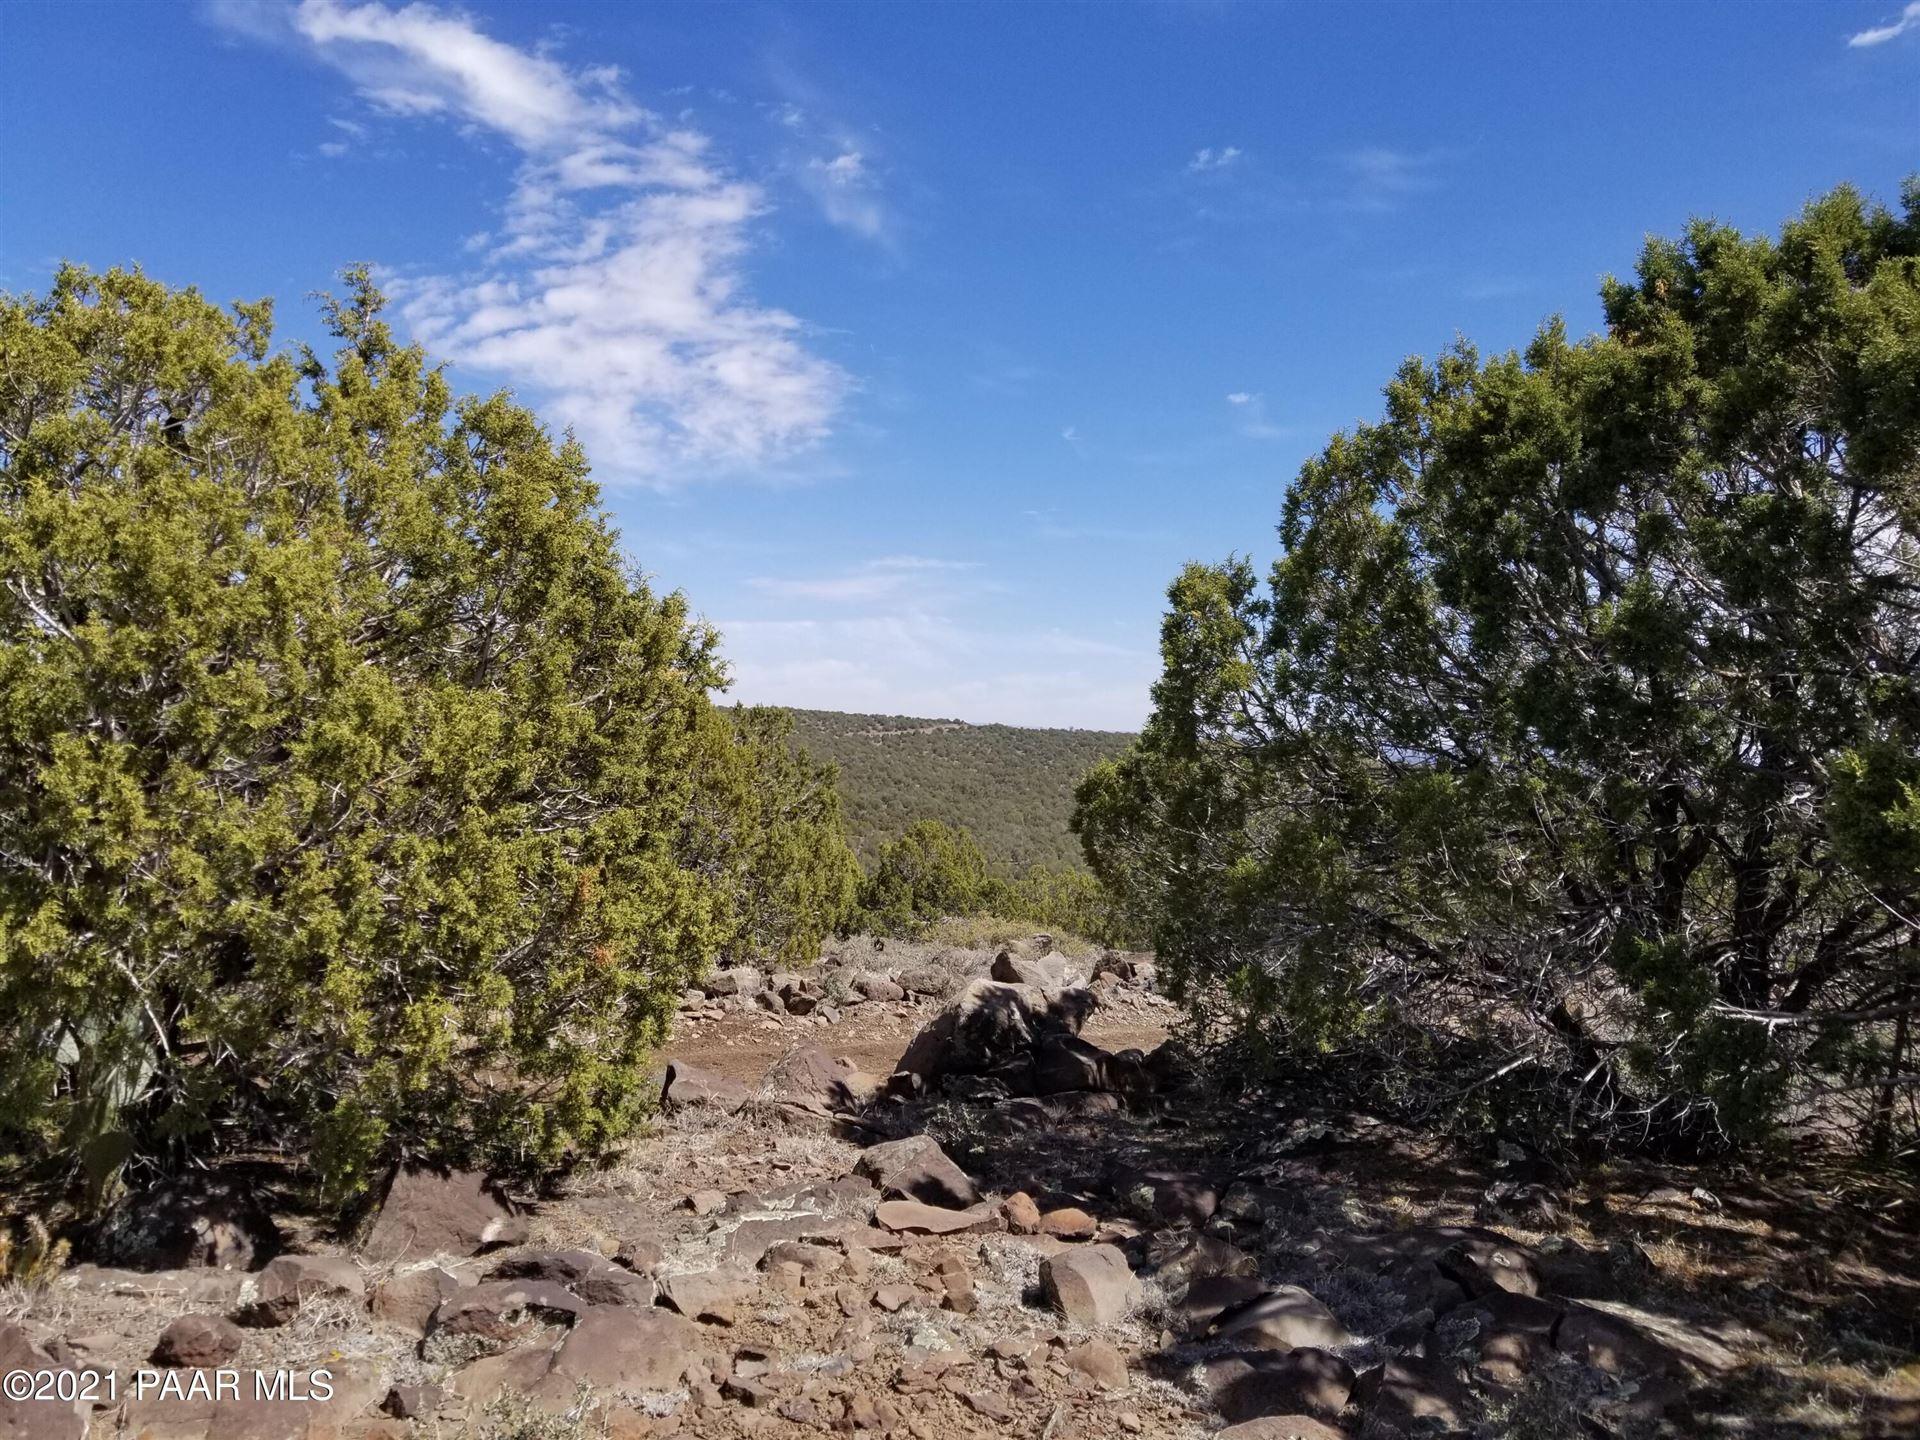 Photo of 0 Diamond M Ranch Rd #Lot: 0, Kingman, AZ 86401 (MLS # 1039496)